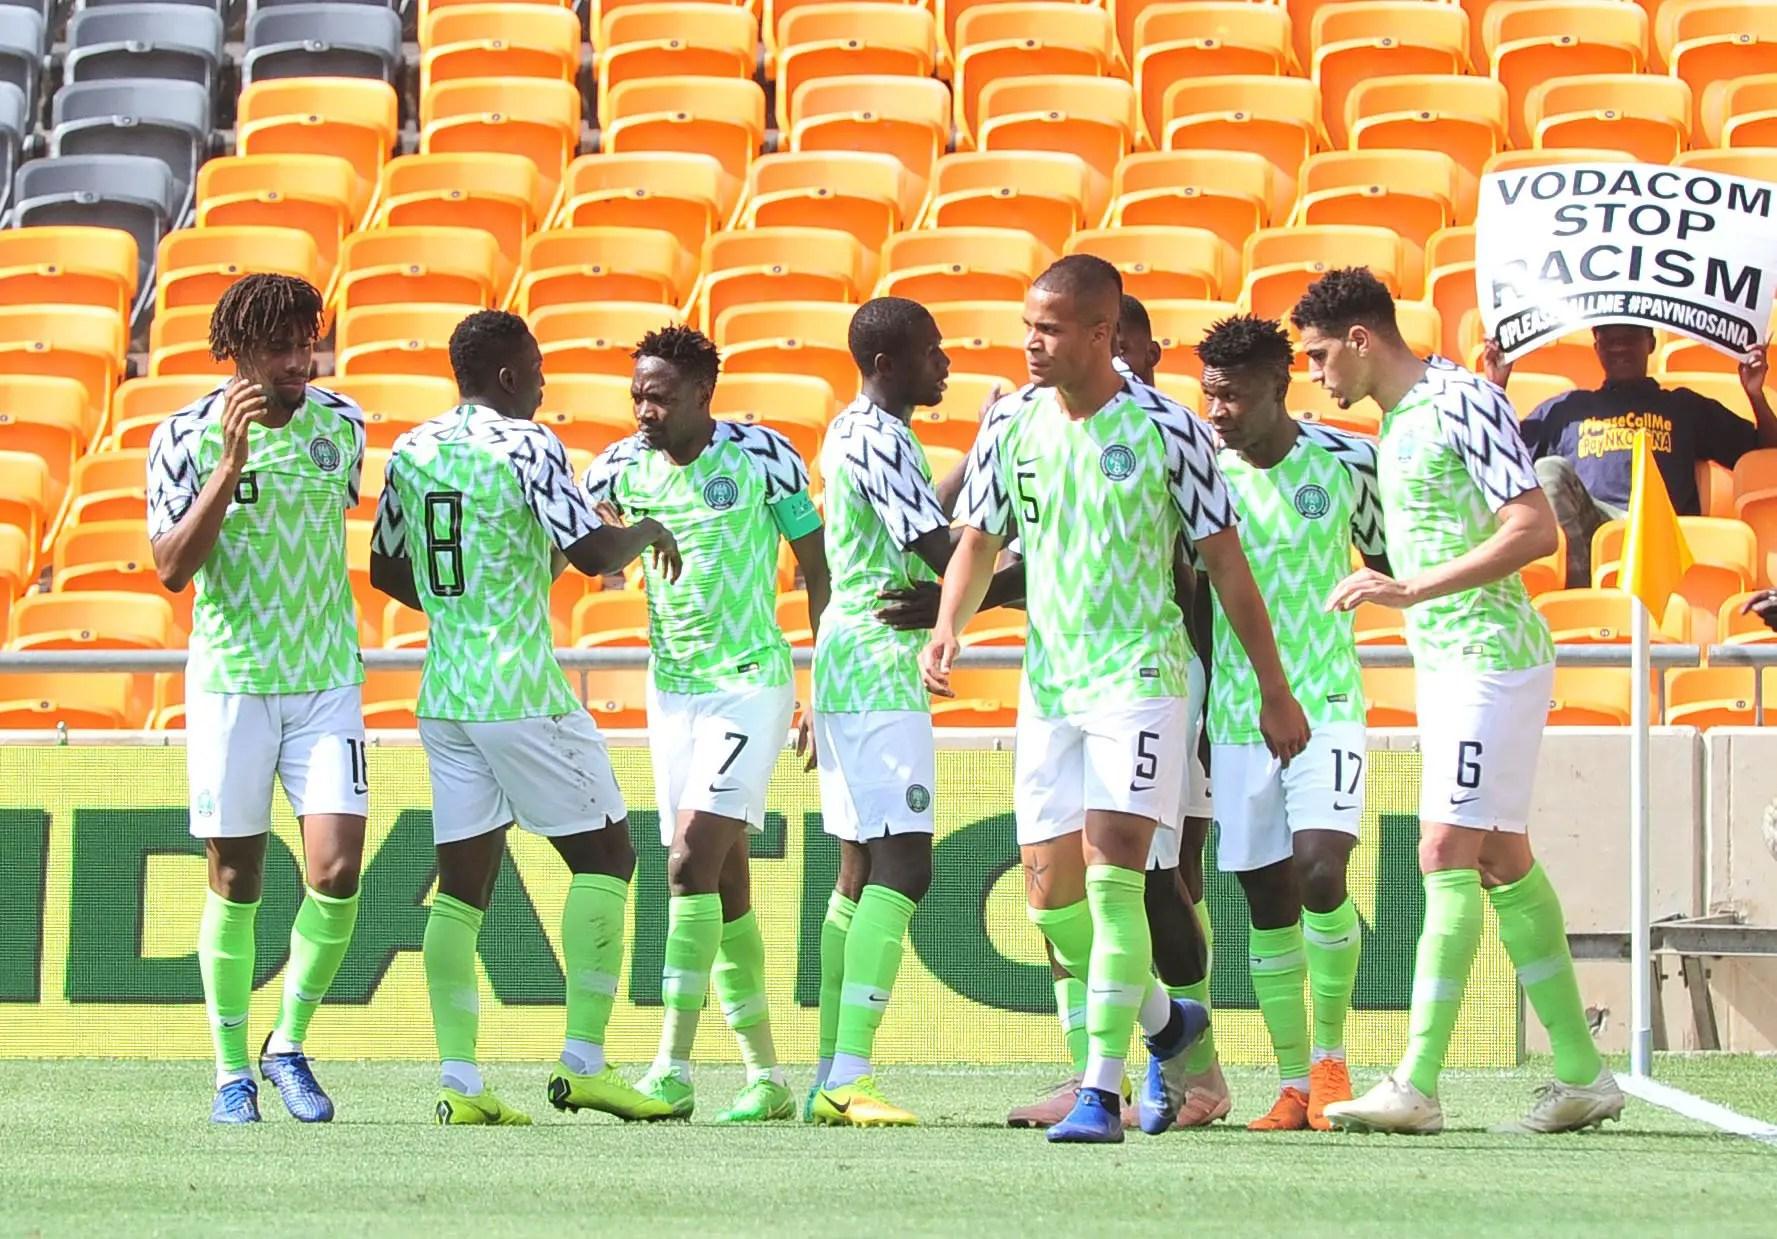 Rohr Talks Up Super Eagles' Positives Ahead AFCON 2019; Disallowed Goals Vs Bafana; Return of Mikel, Simon, Salisu